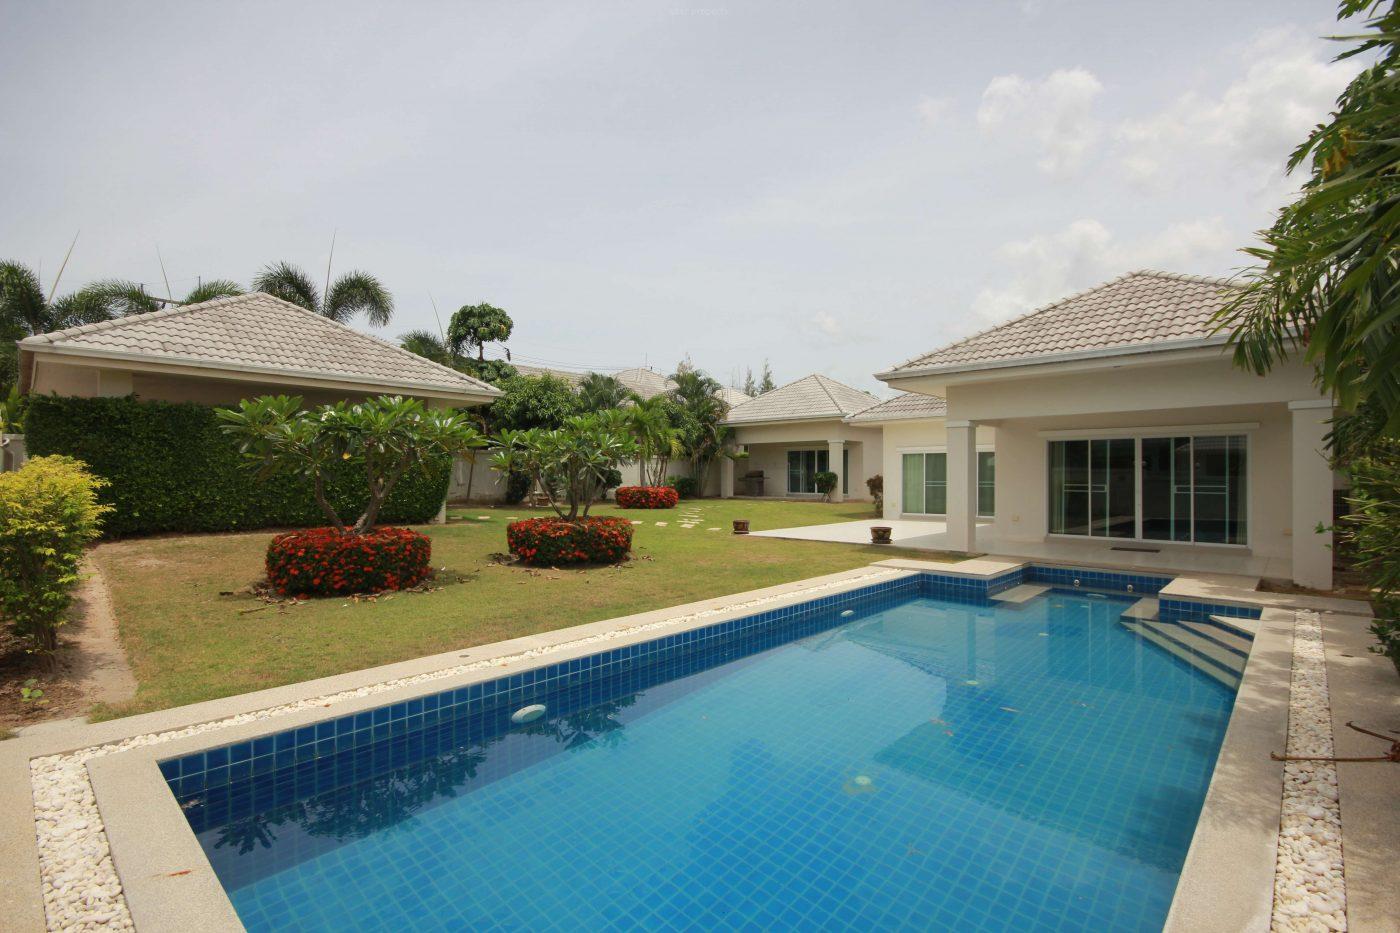 Beautiful Pool Villa for Sale at Gold Soi 88 at Hua Hin District, Prachuap Khiri Khan, Thailand